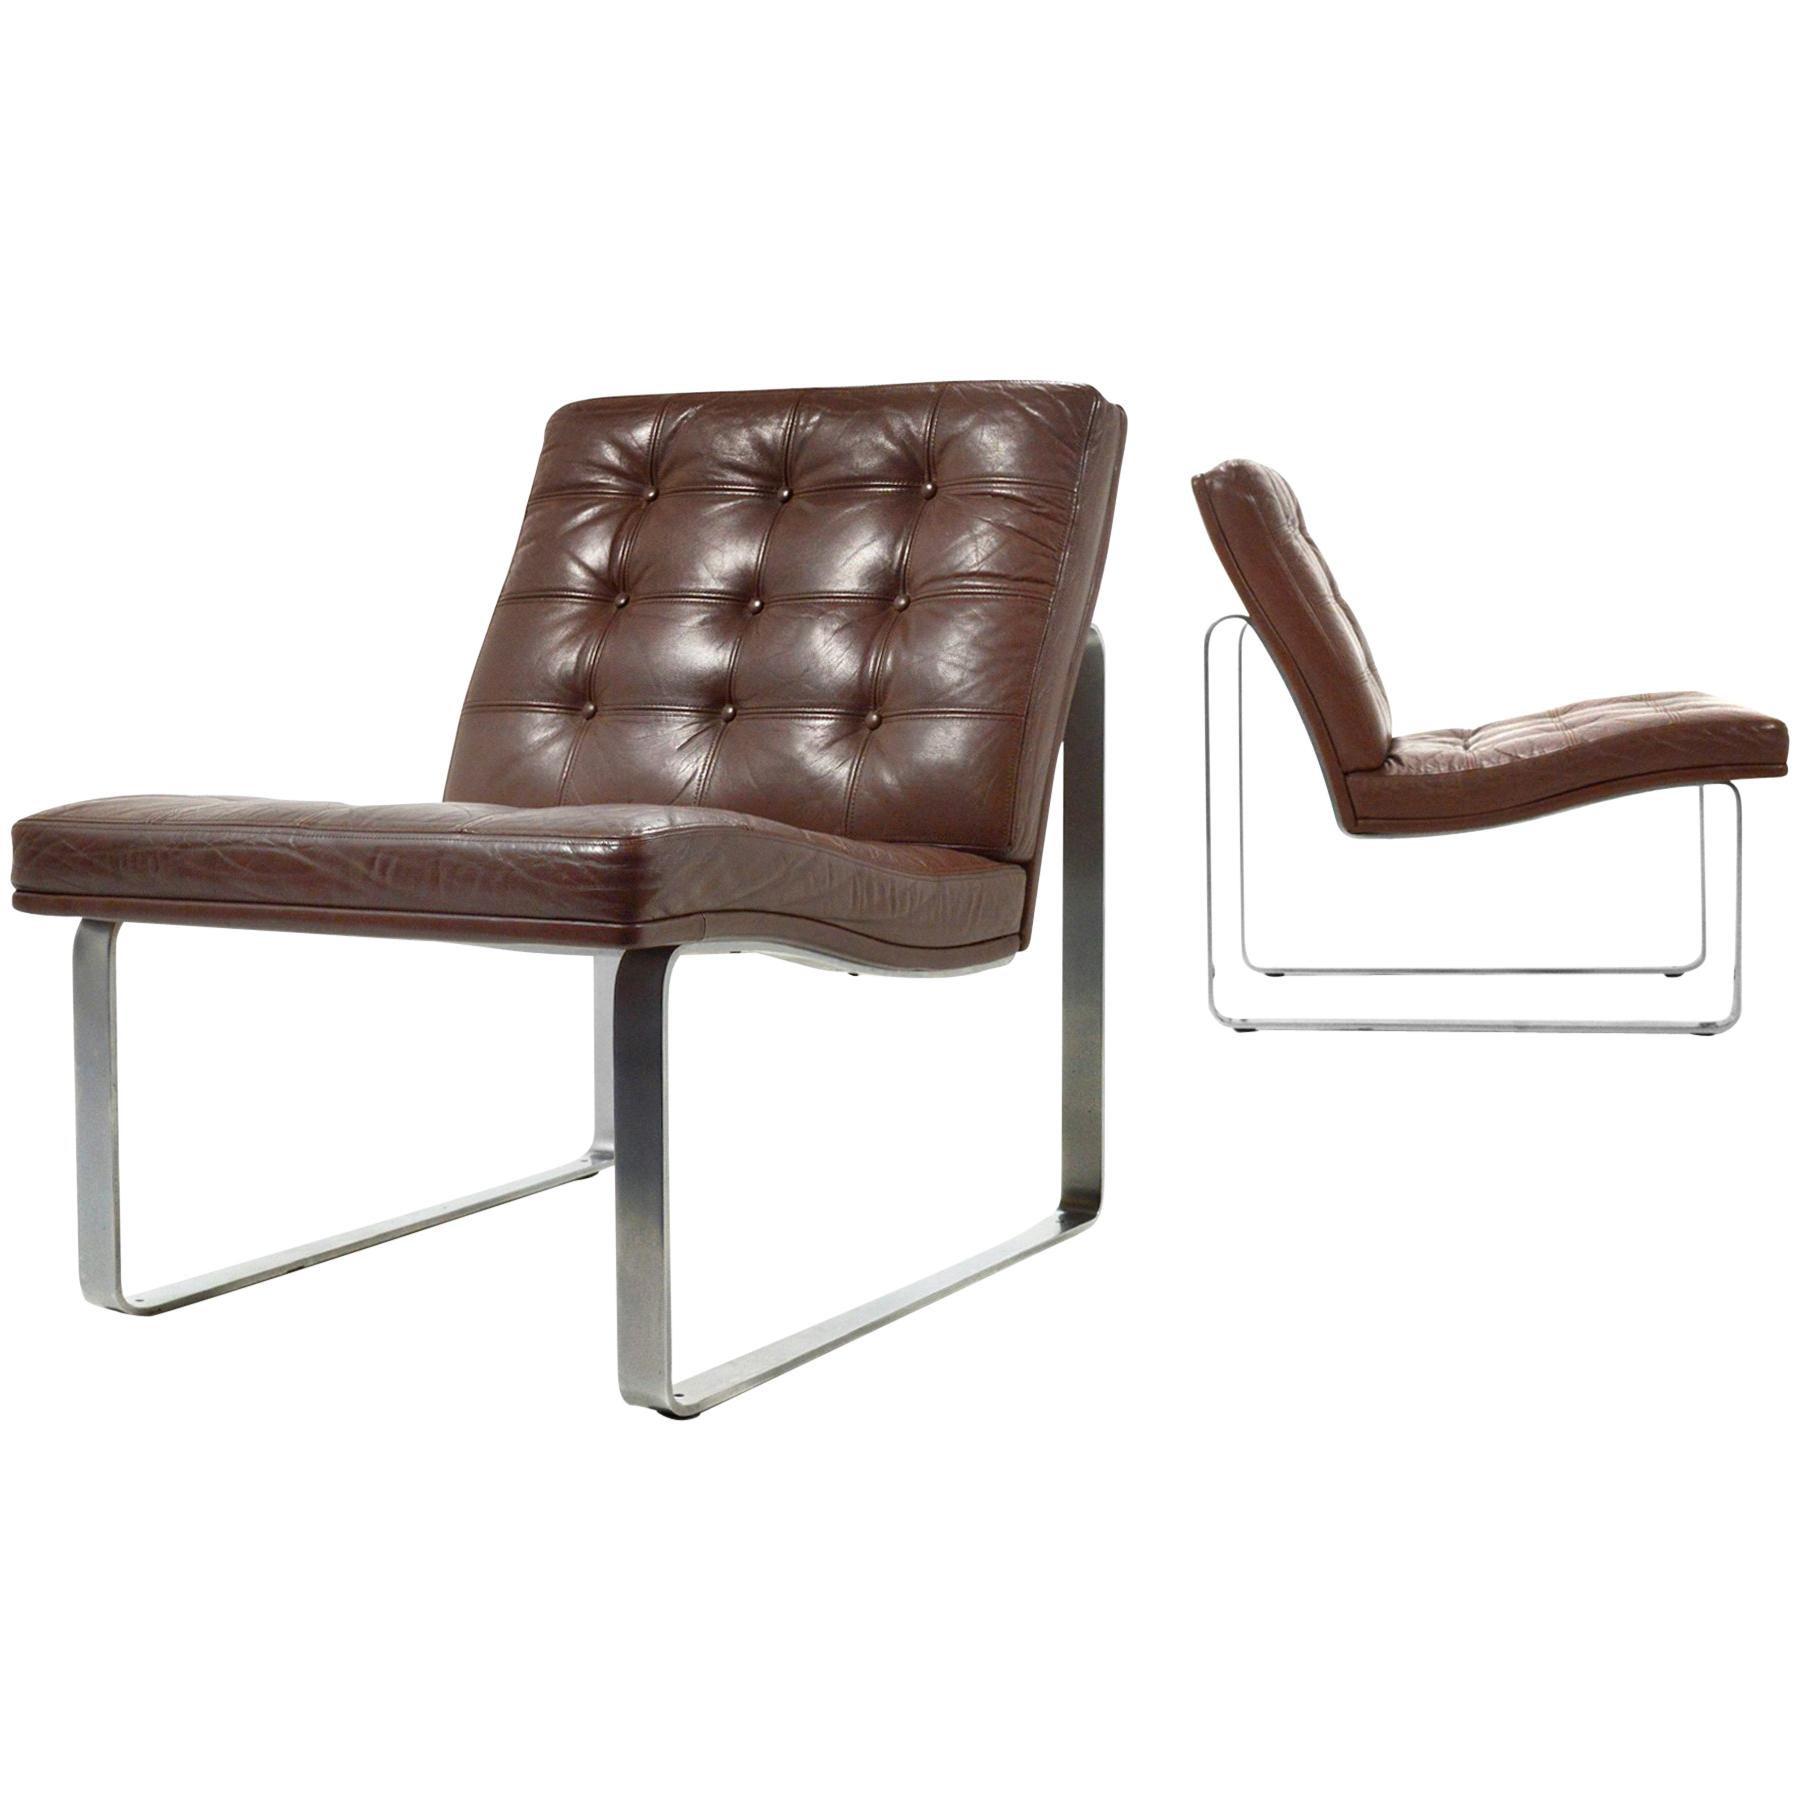 Ole Gjerløv-Knudsen Moduline Lounge Chairs by France & Son